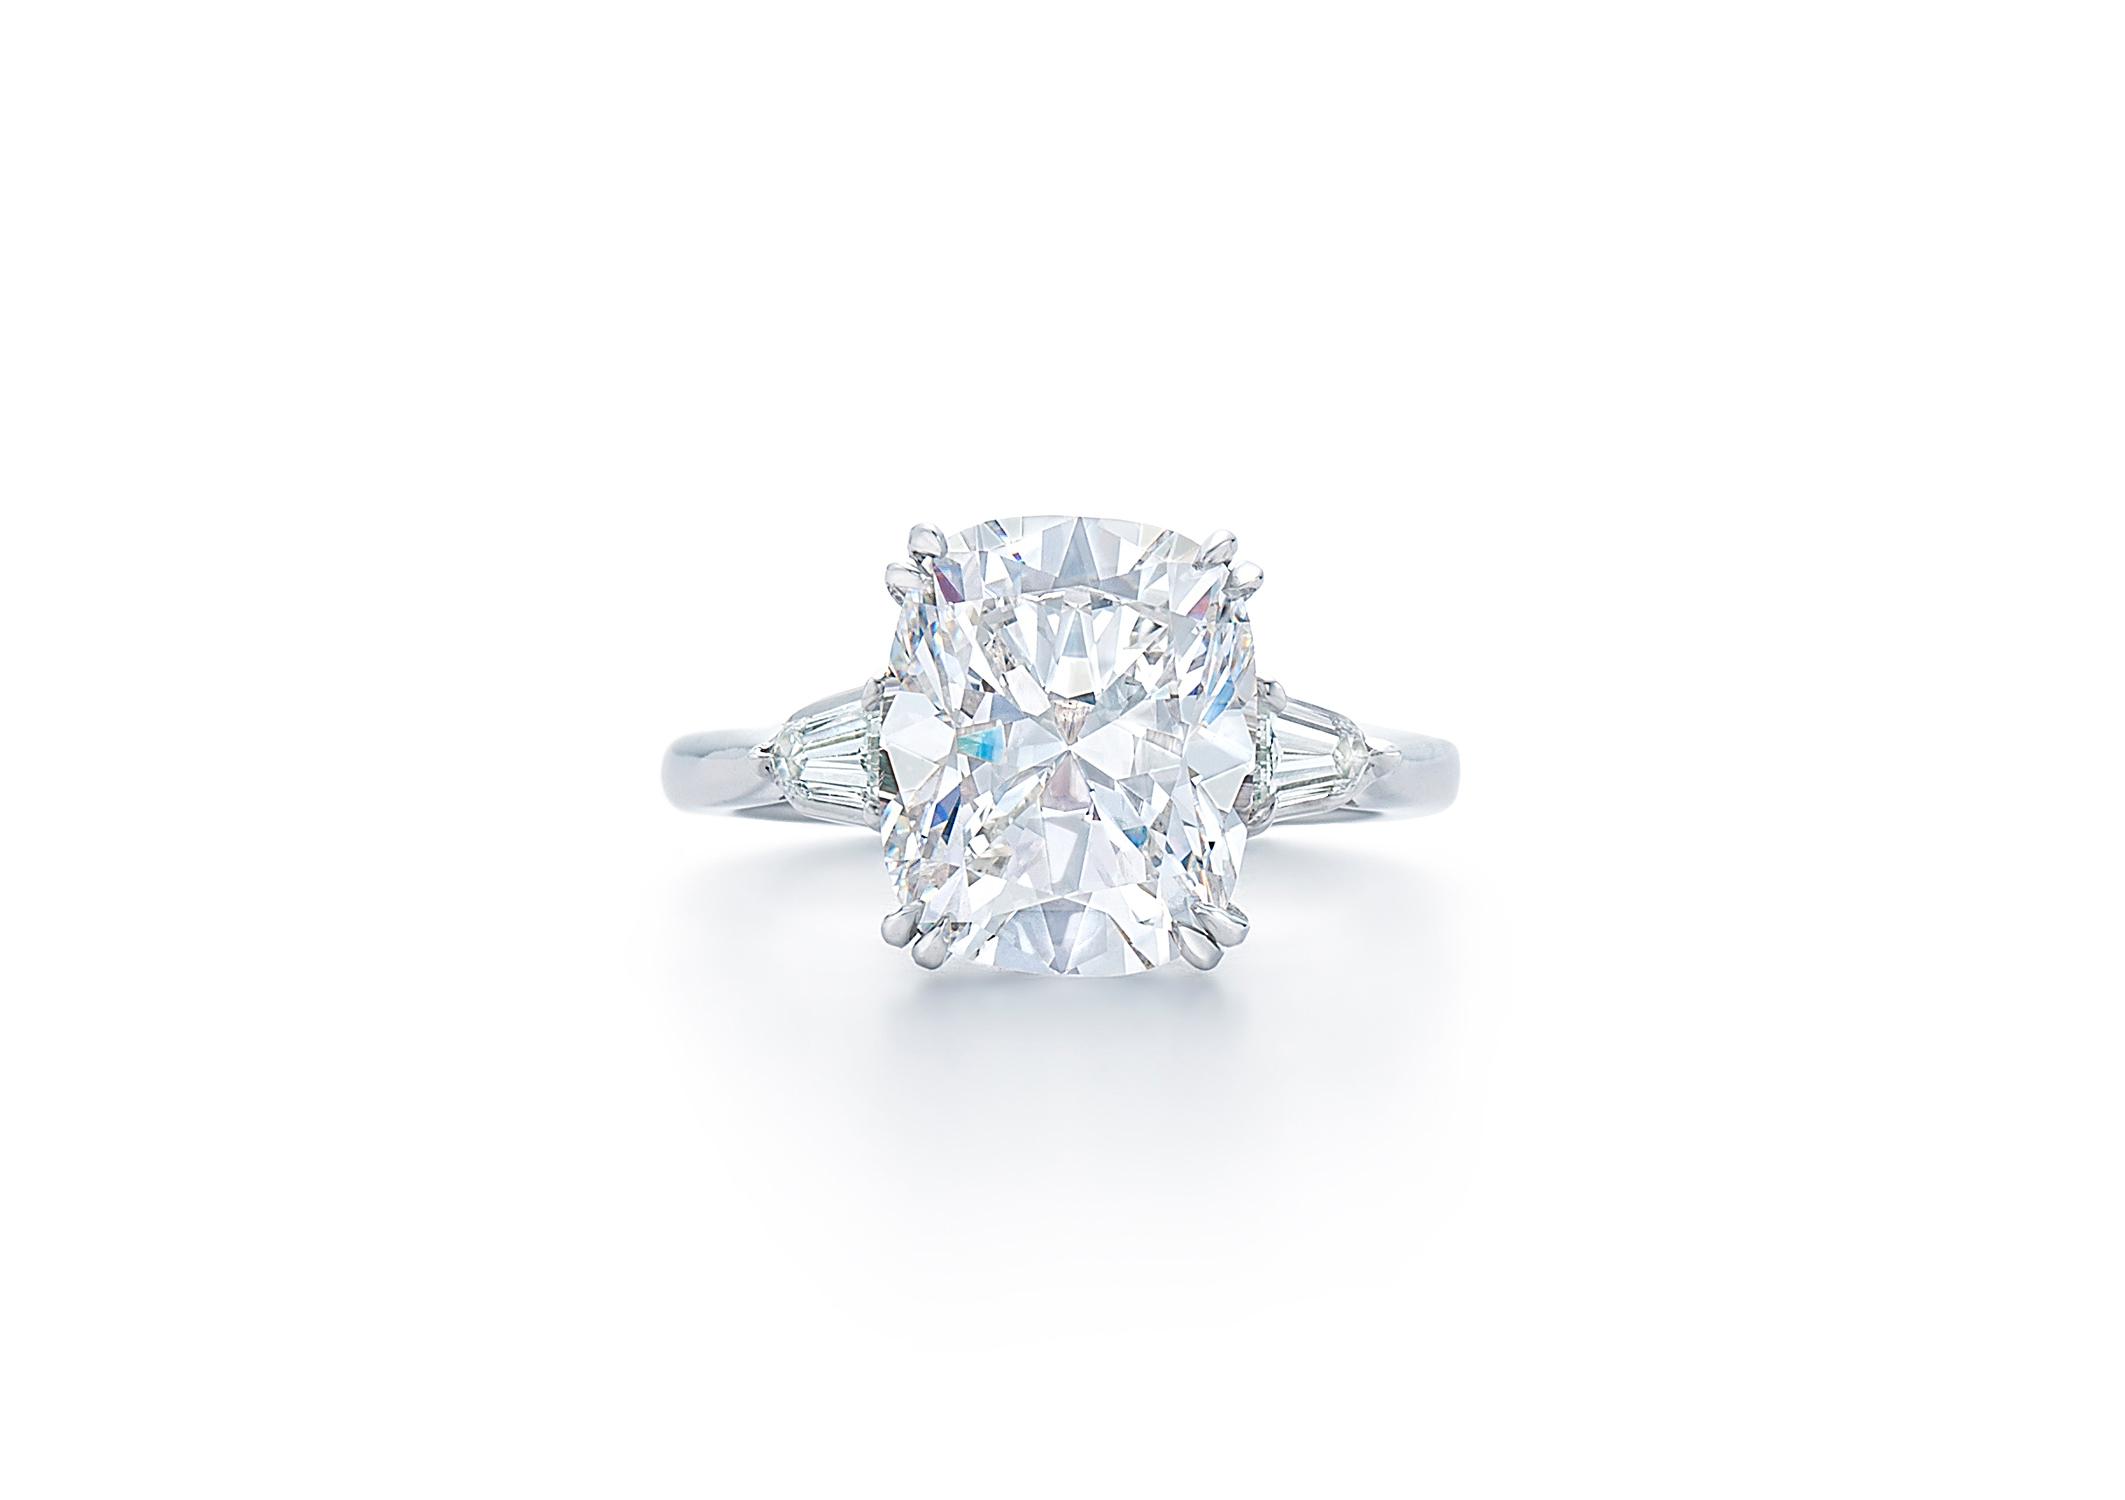 kwiat cushion cut diamond baguette diamonds on side engagement ring